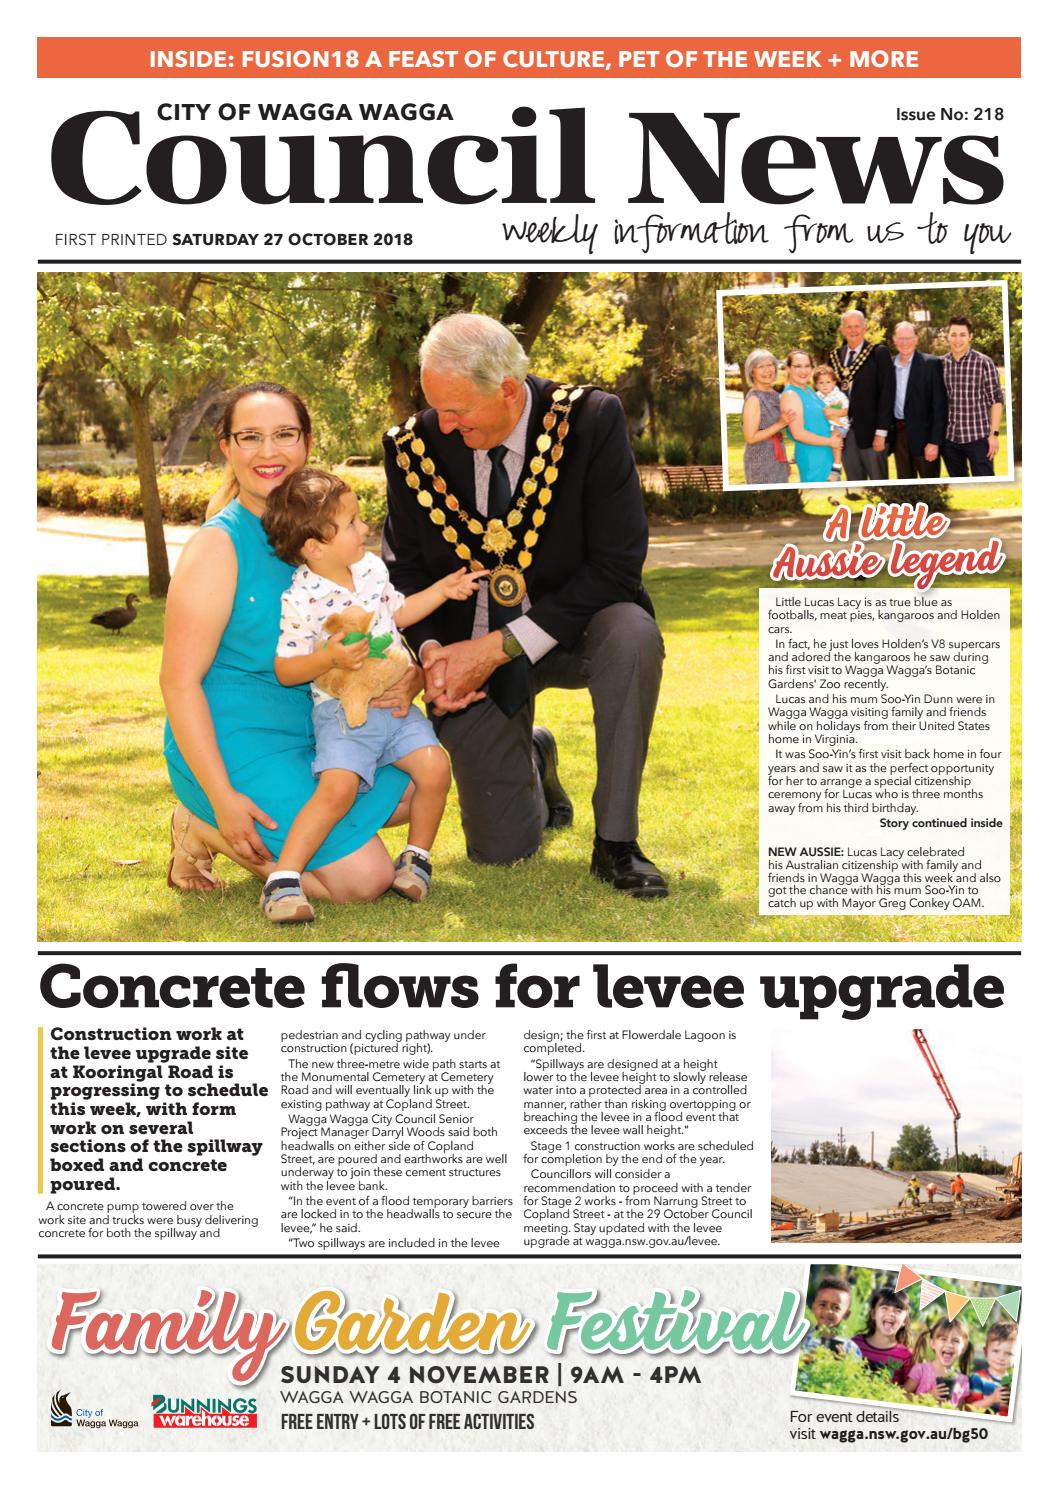 Council News #218 27 October 2018 by Wagga Wagga City